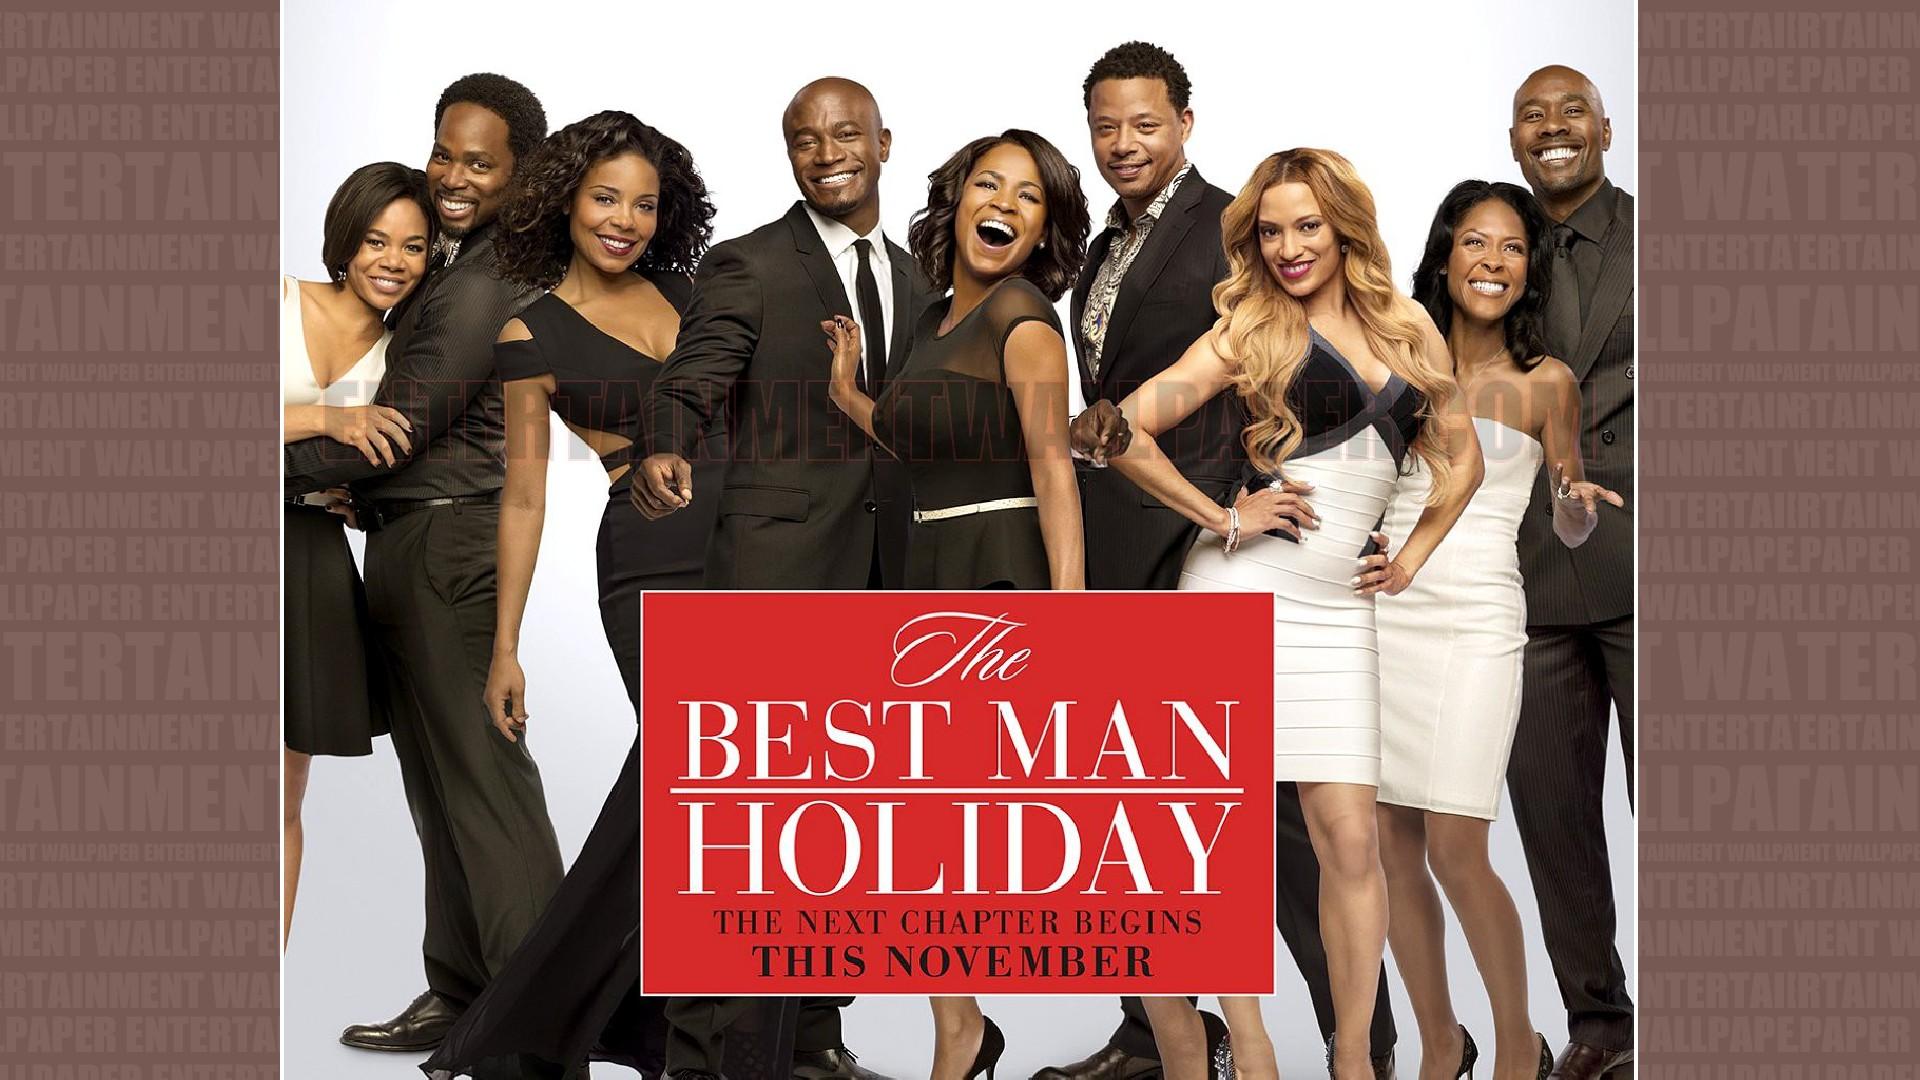 Best man holiday movie 2018